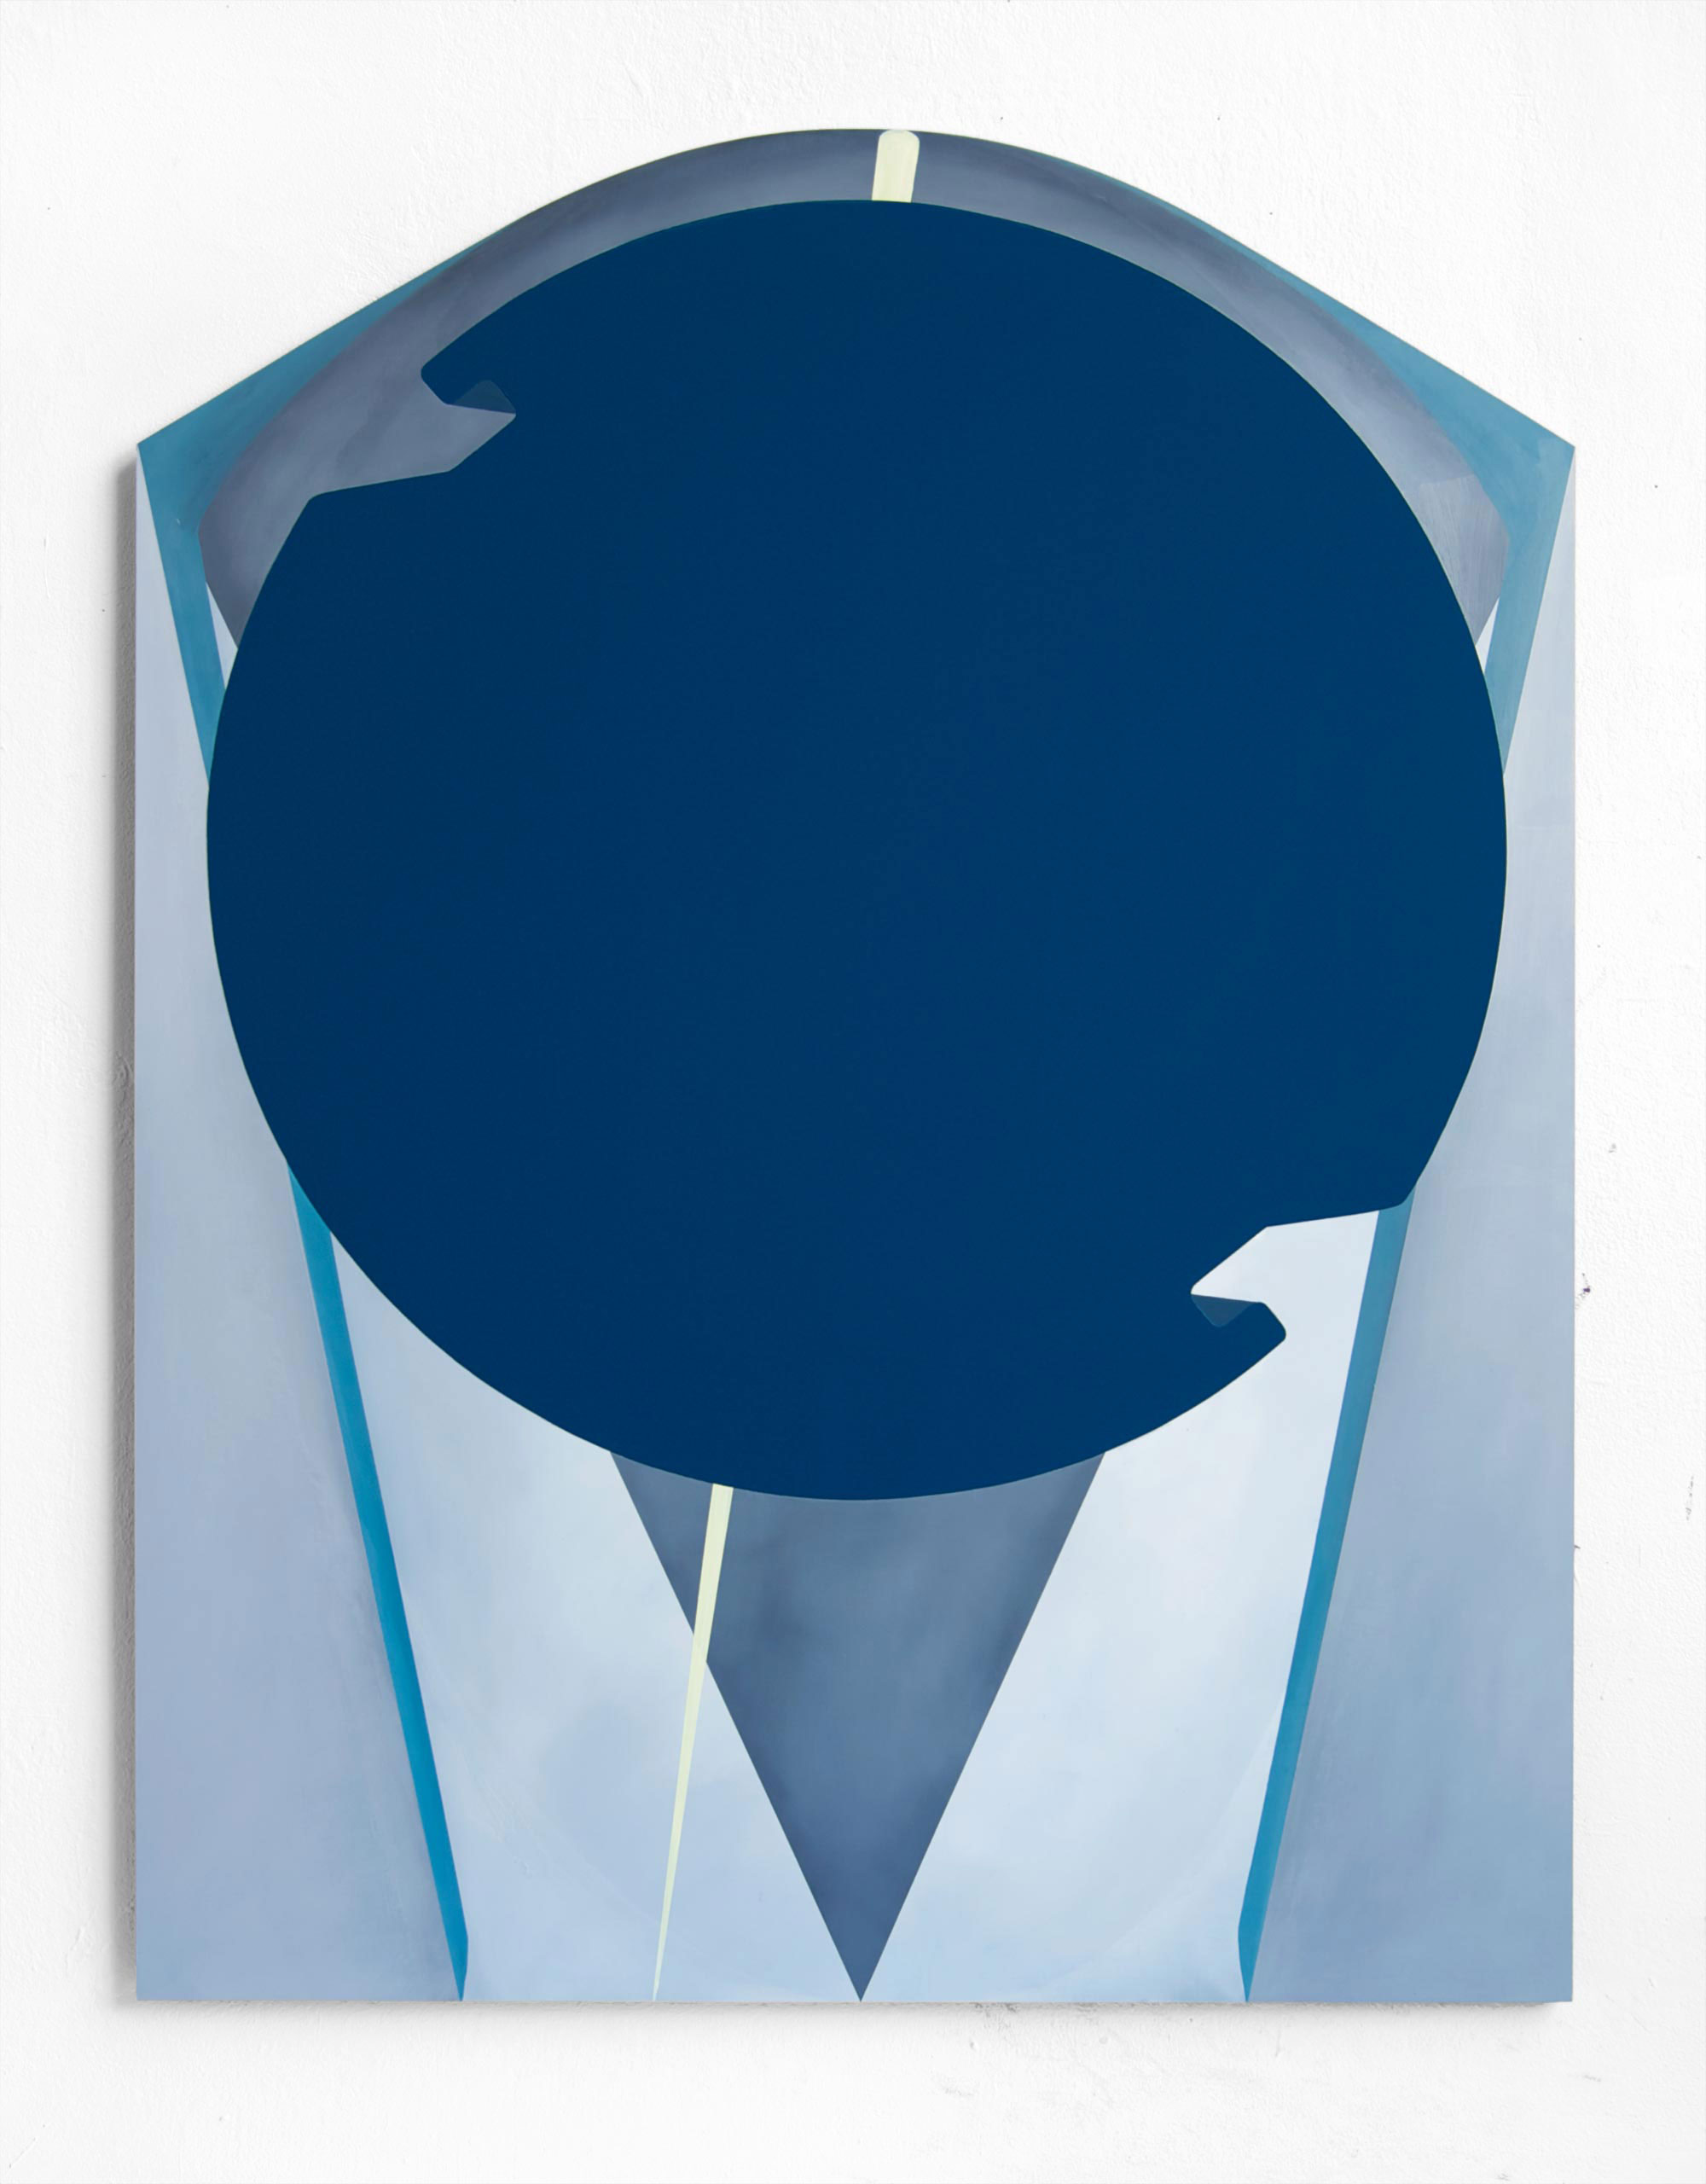 Florina Leinß: Mirroring Masks